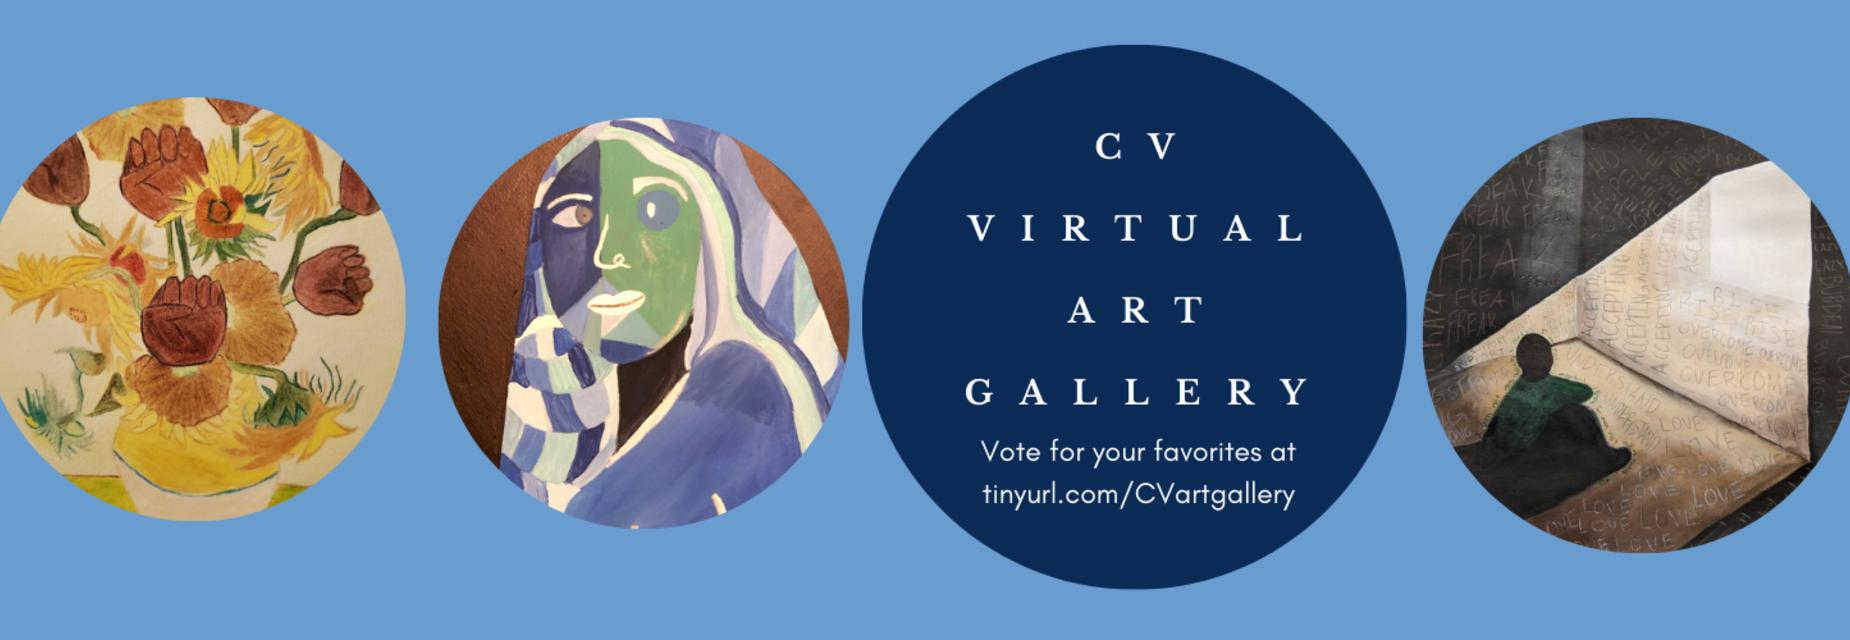 CV Virtual Art Show